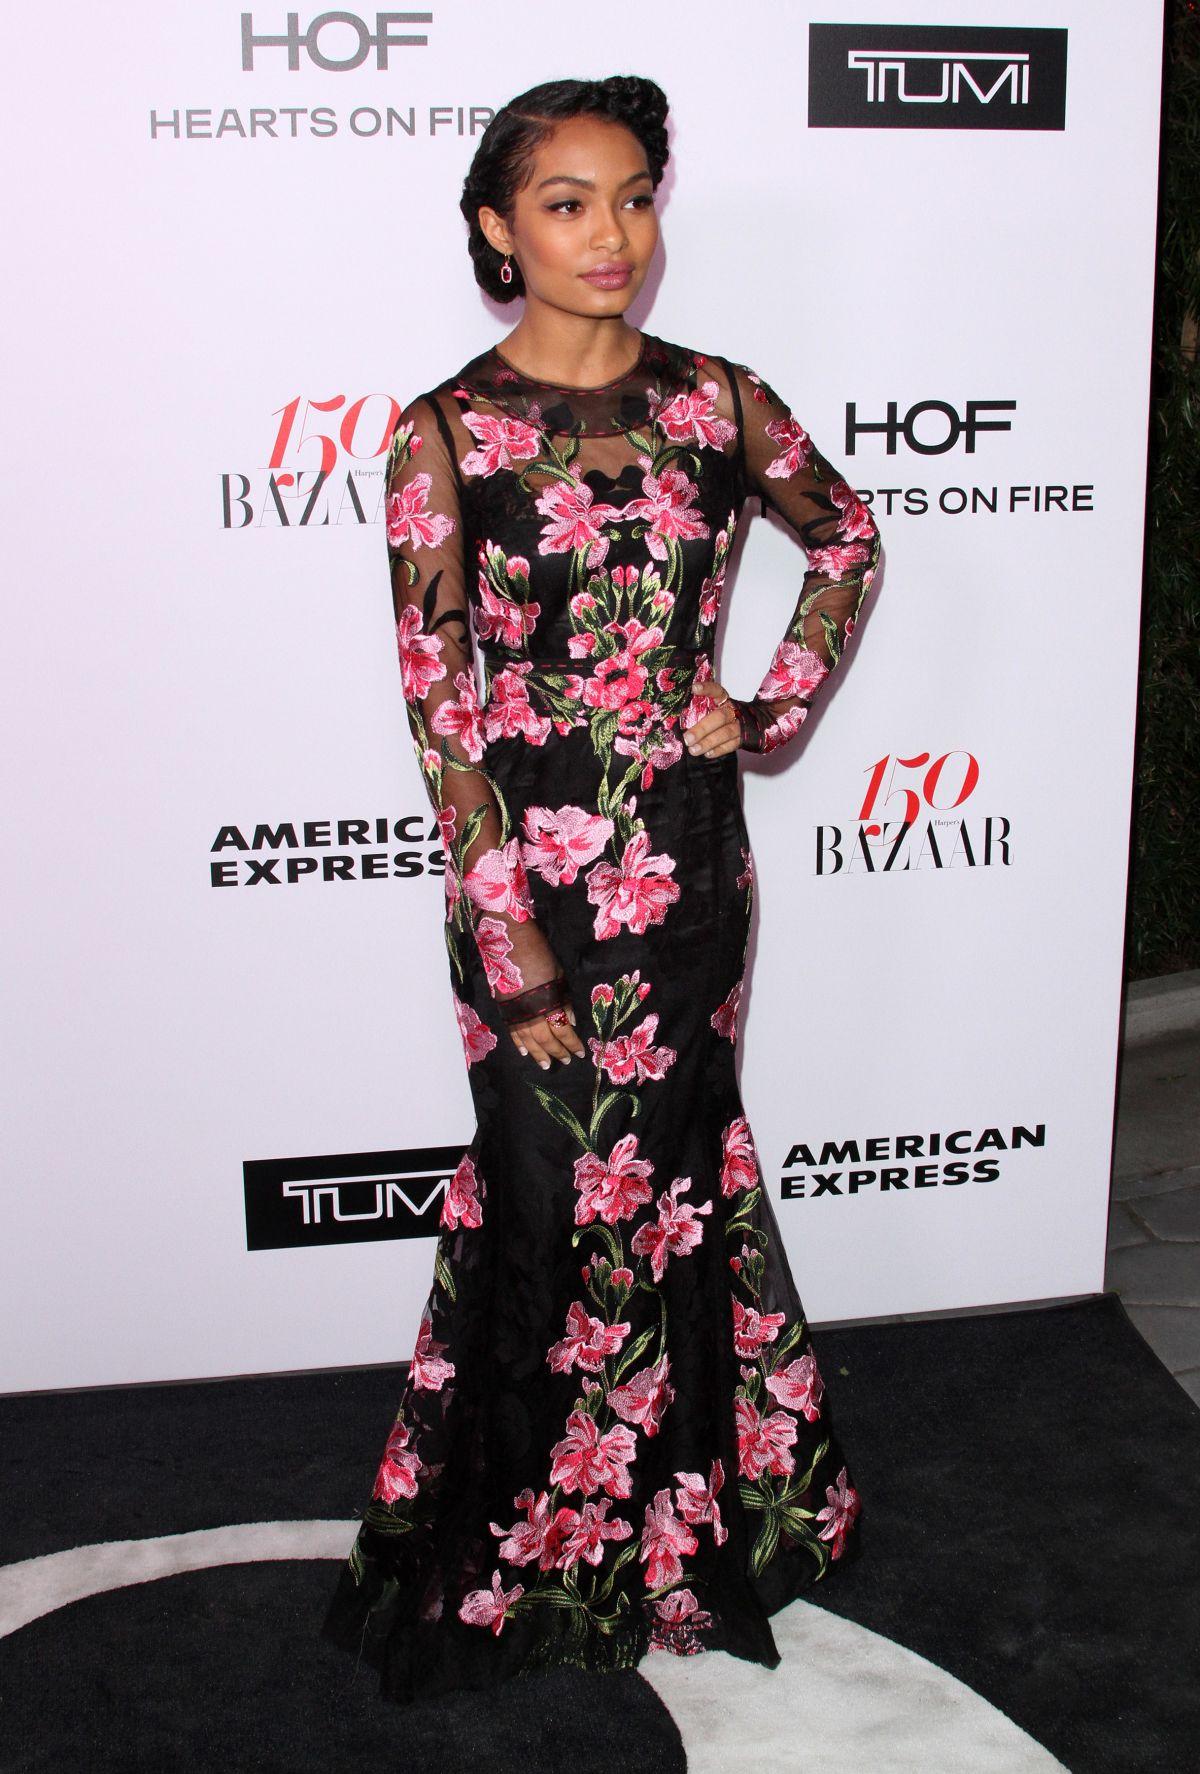 YARA SHAHIDI at Harper's Bazaar 150 Most Fashionable Women Party in Hollywood 01/27/2017